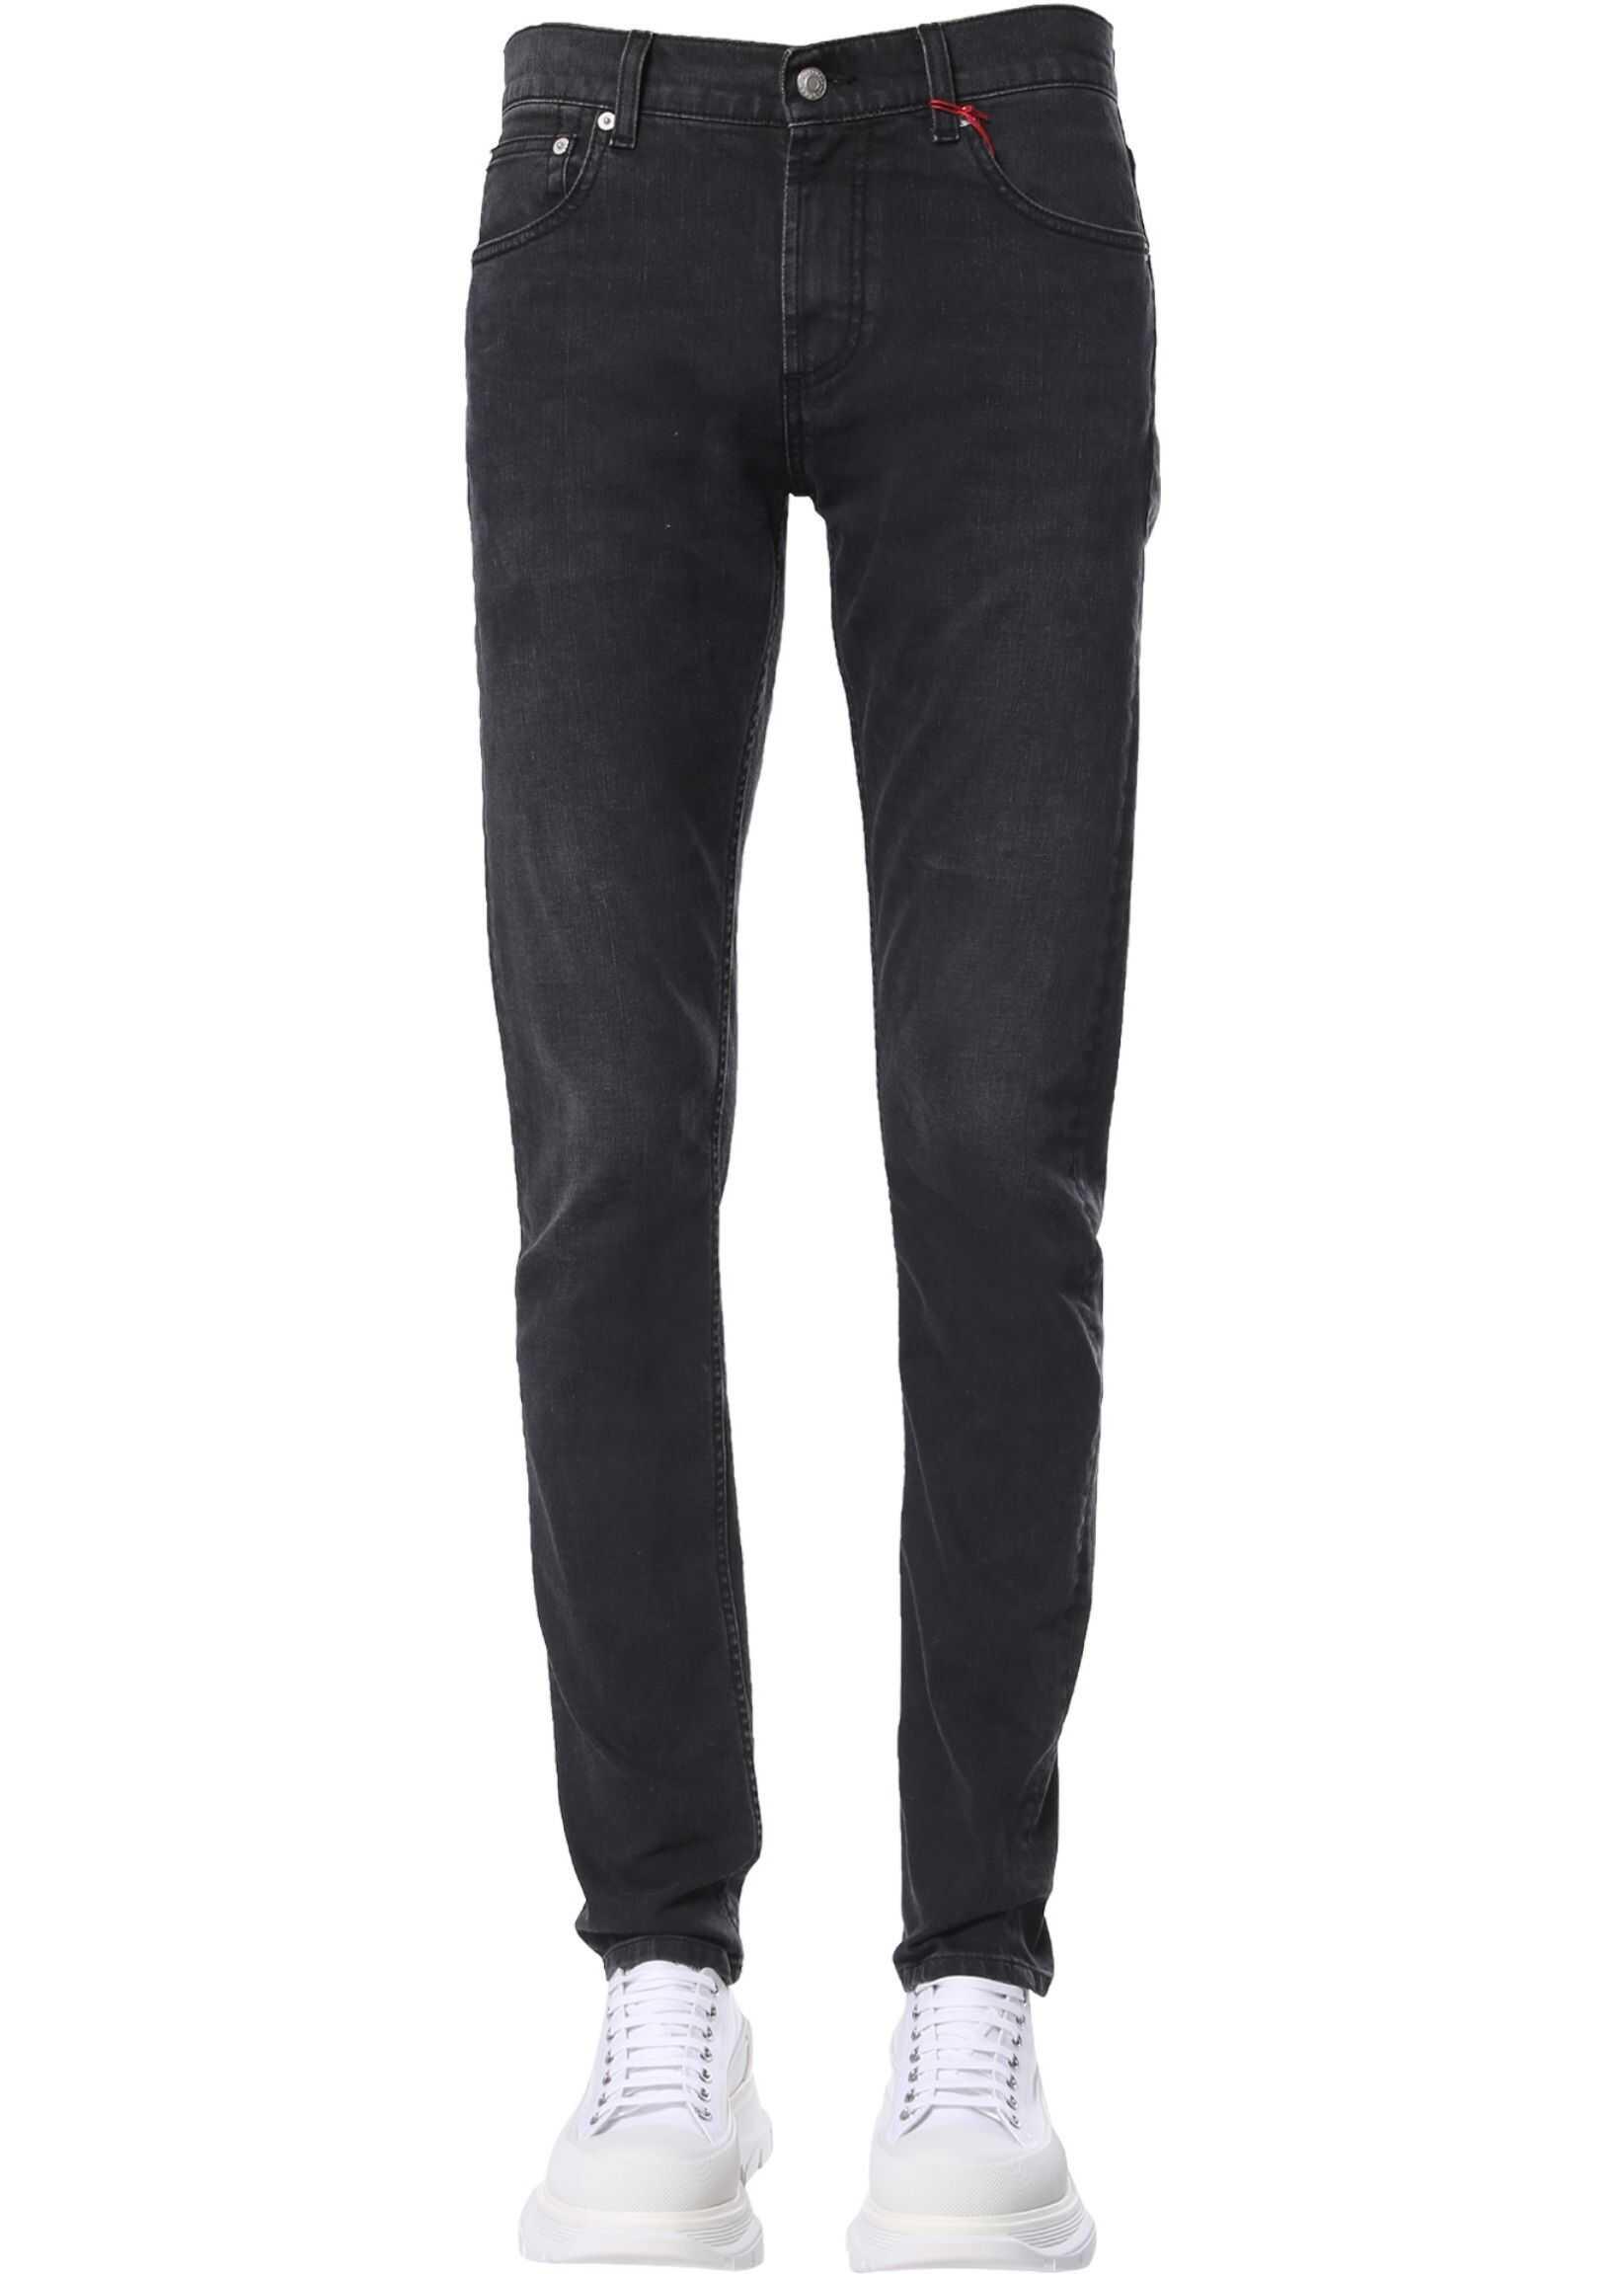 Alexander McQueen Skinny Fit Jeans BLACK